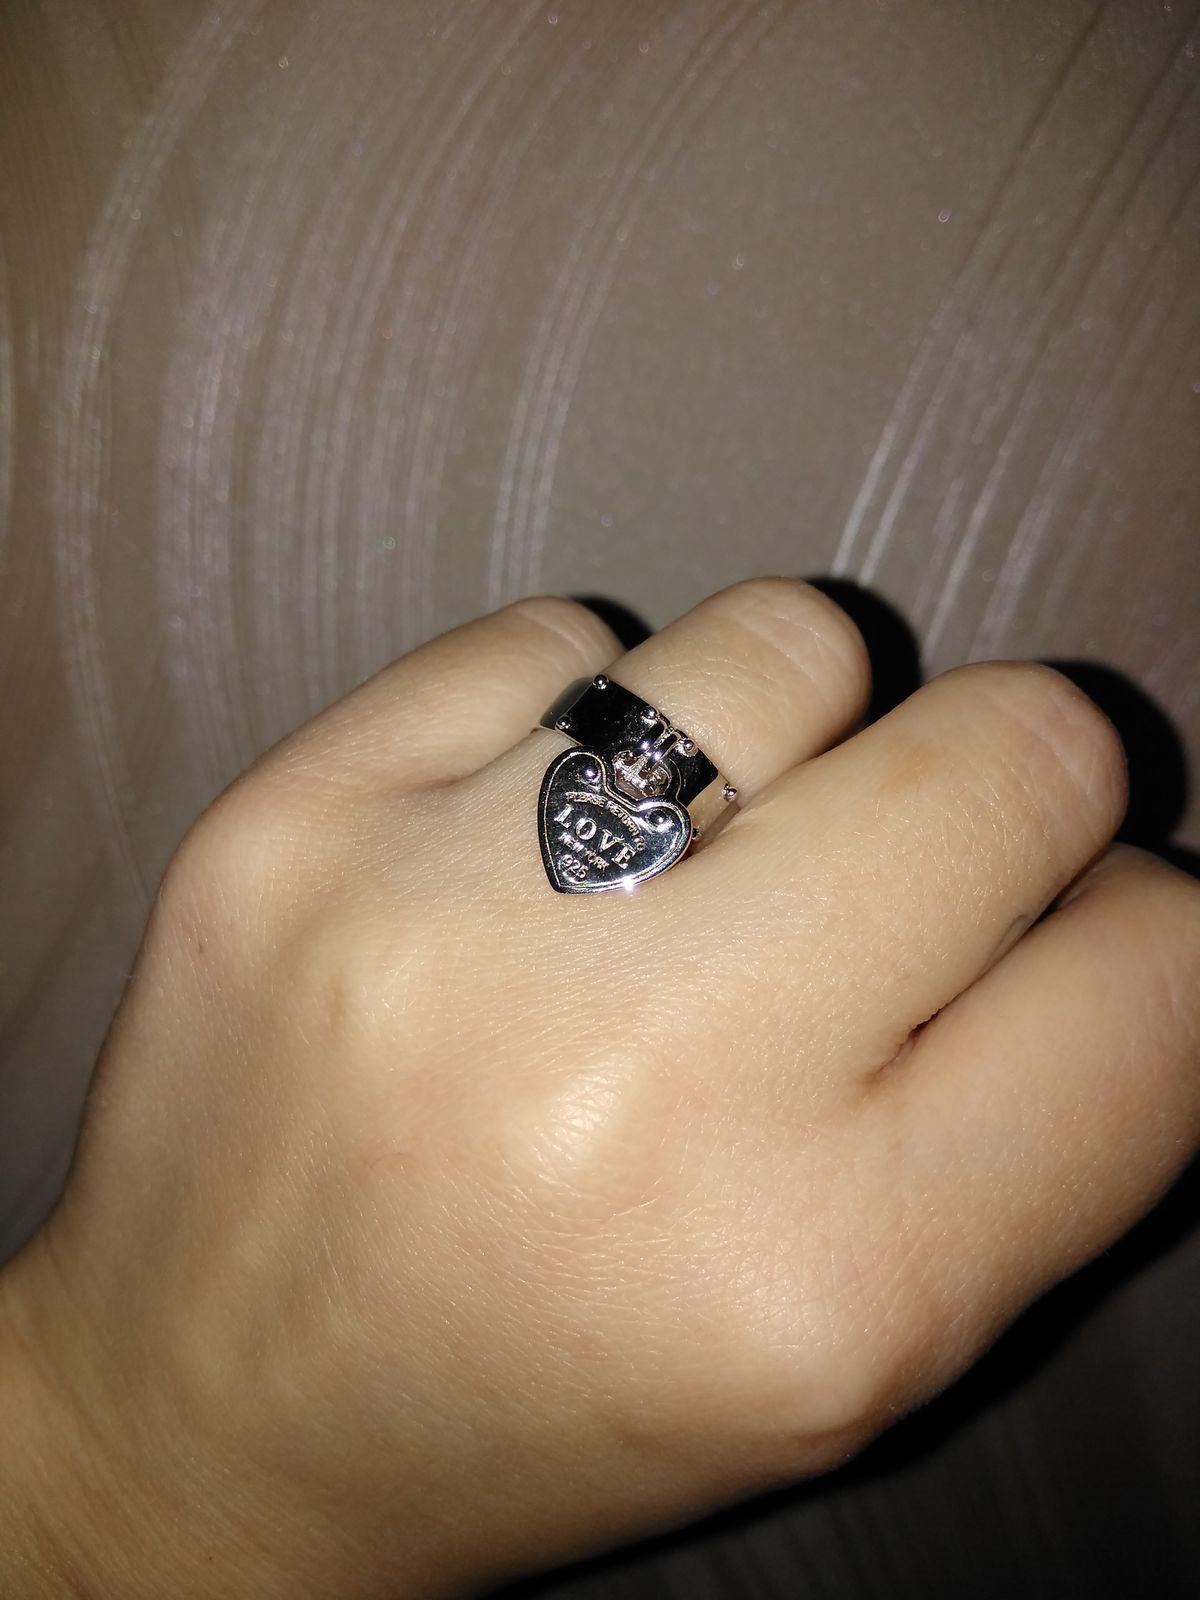 Кольцо очень похоже на аналог от TIFFANY